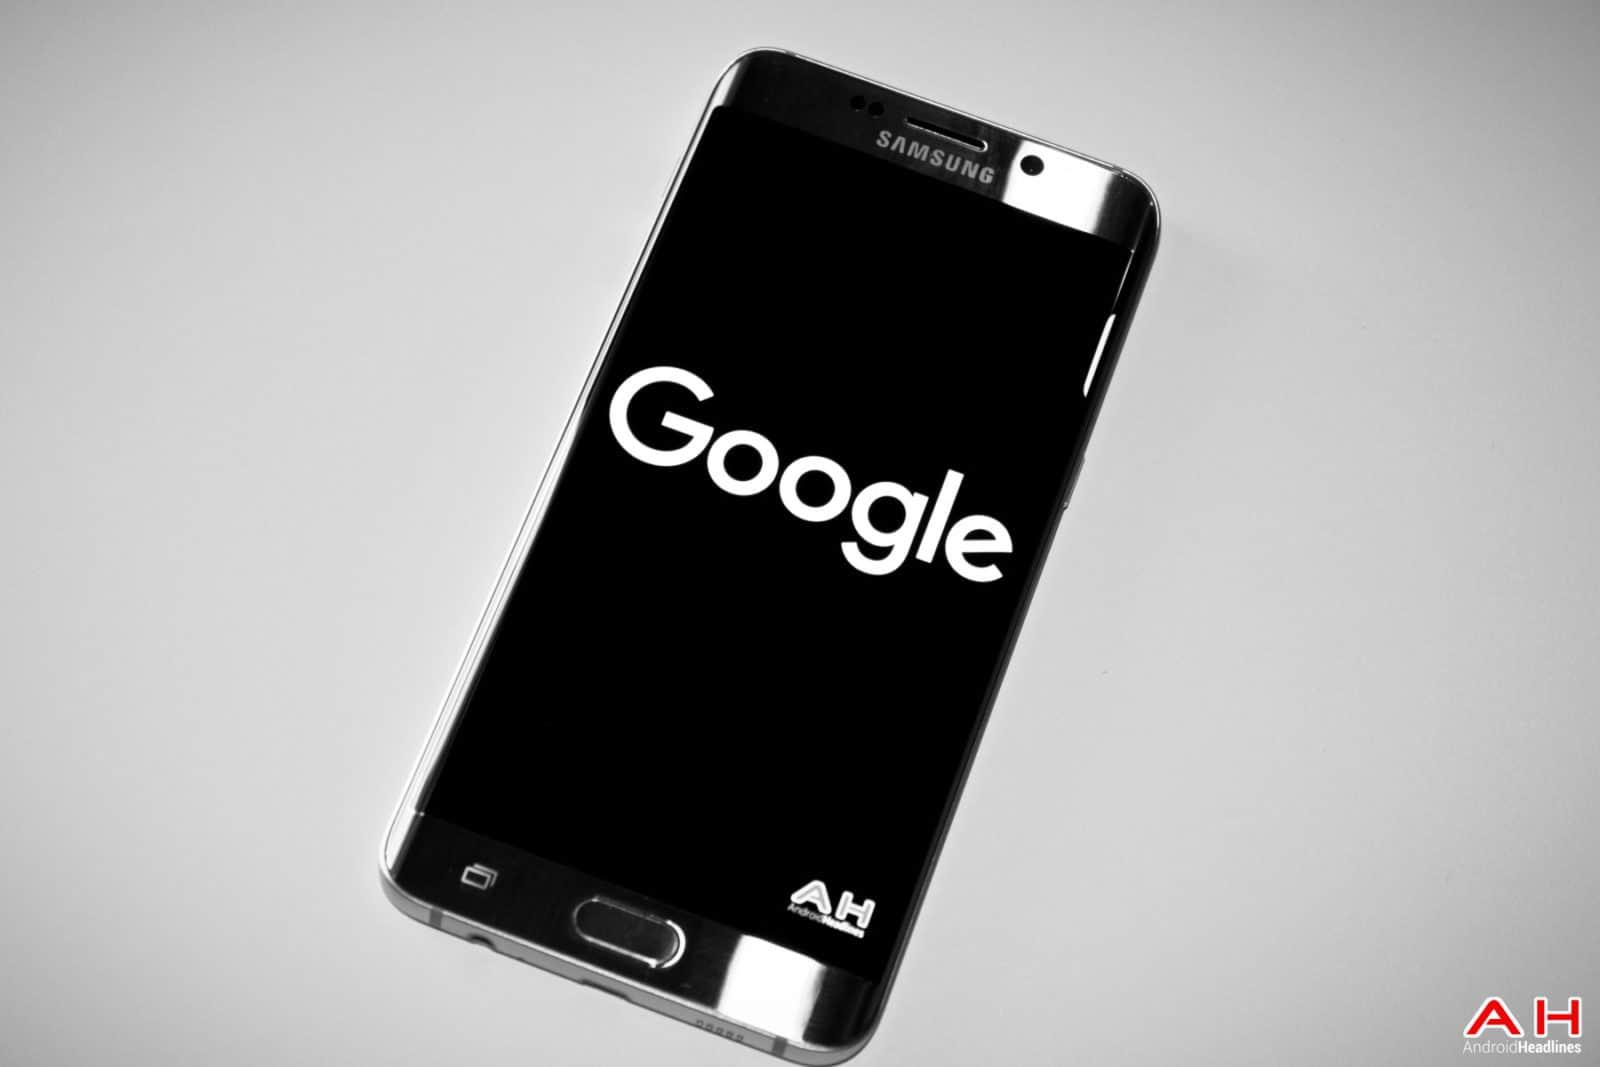 AH 2015 A New Google LOGO-3